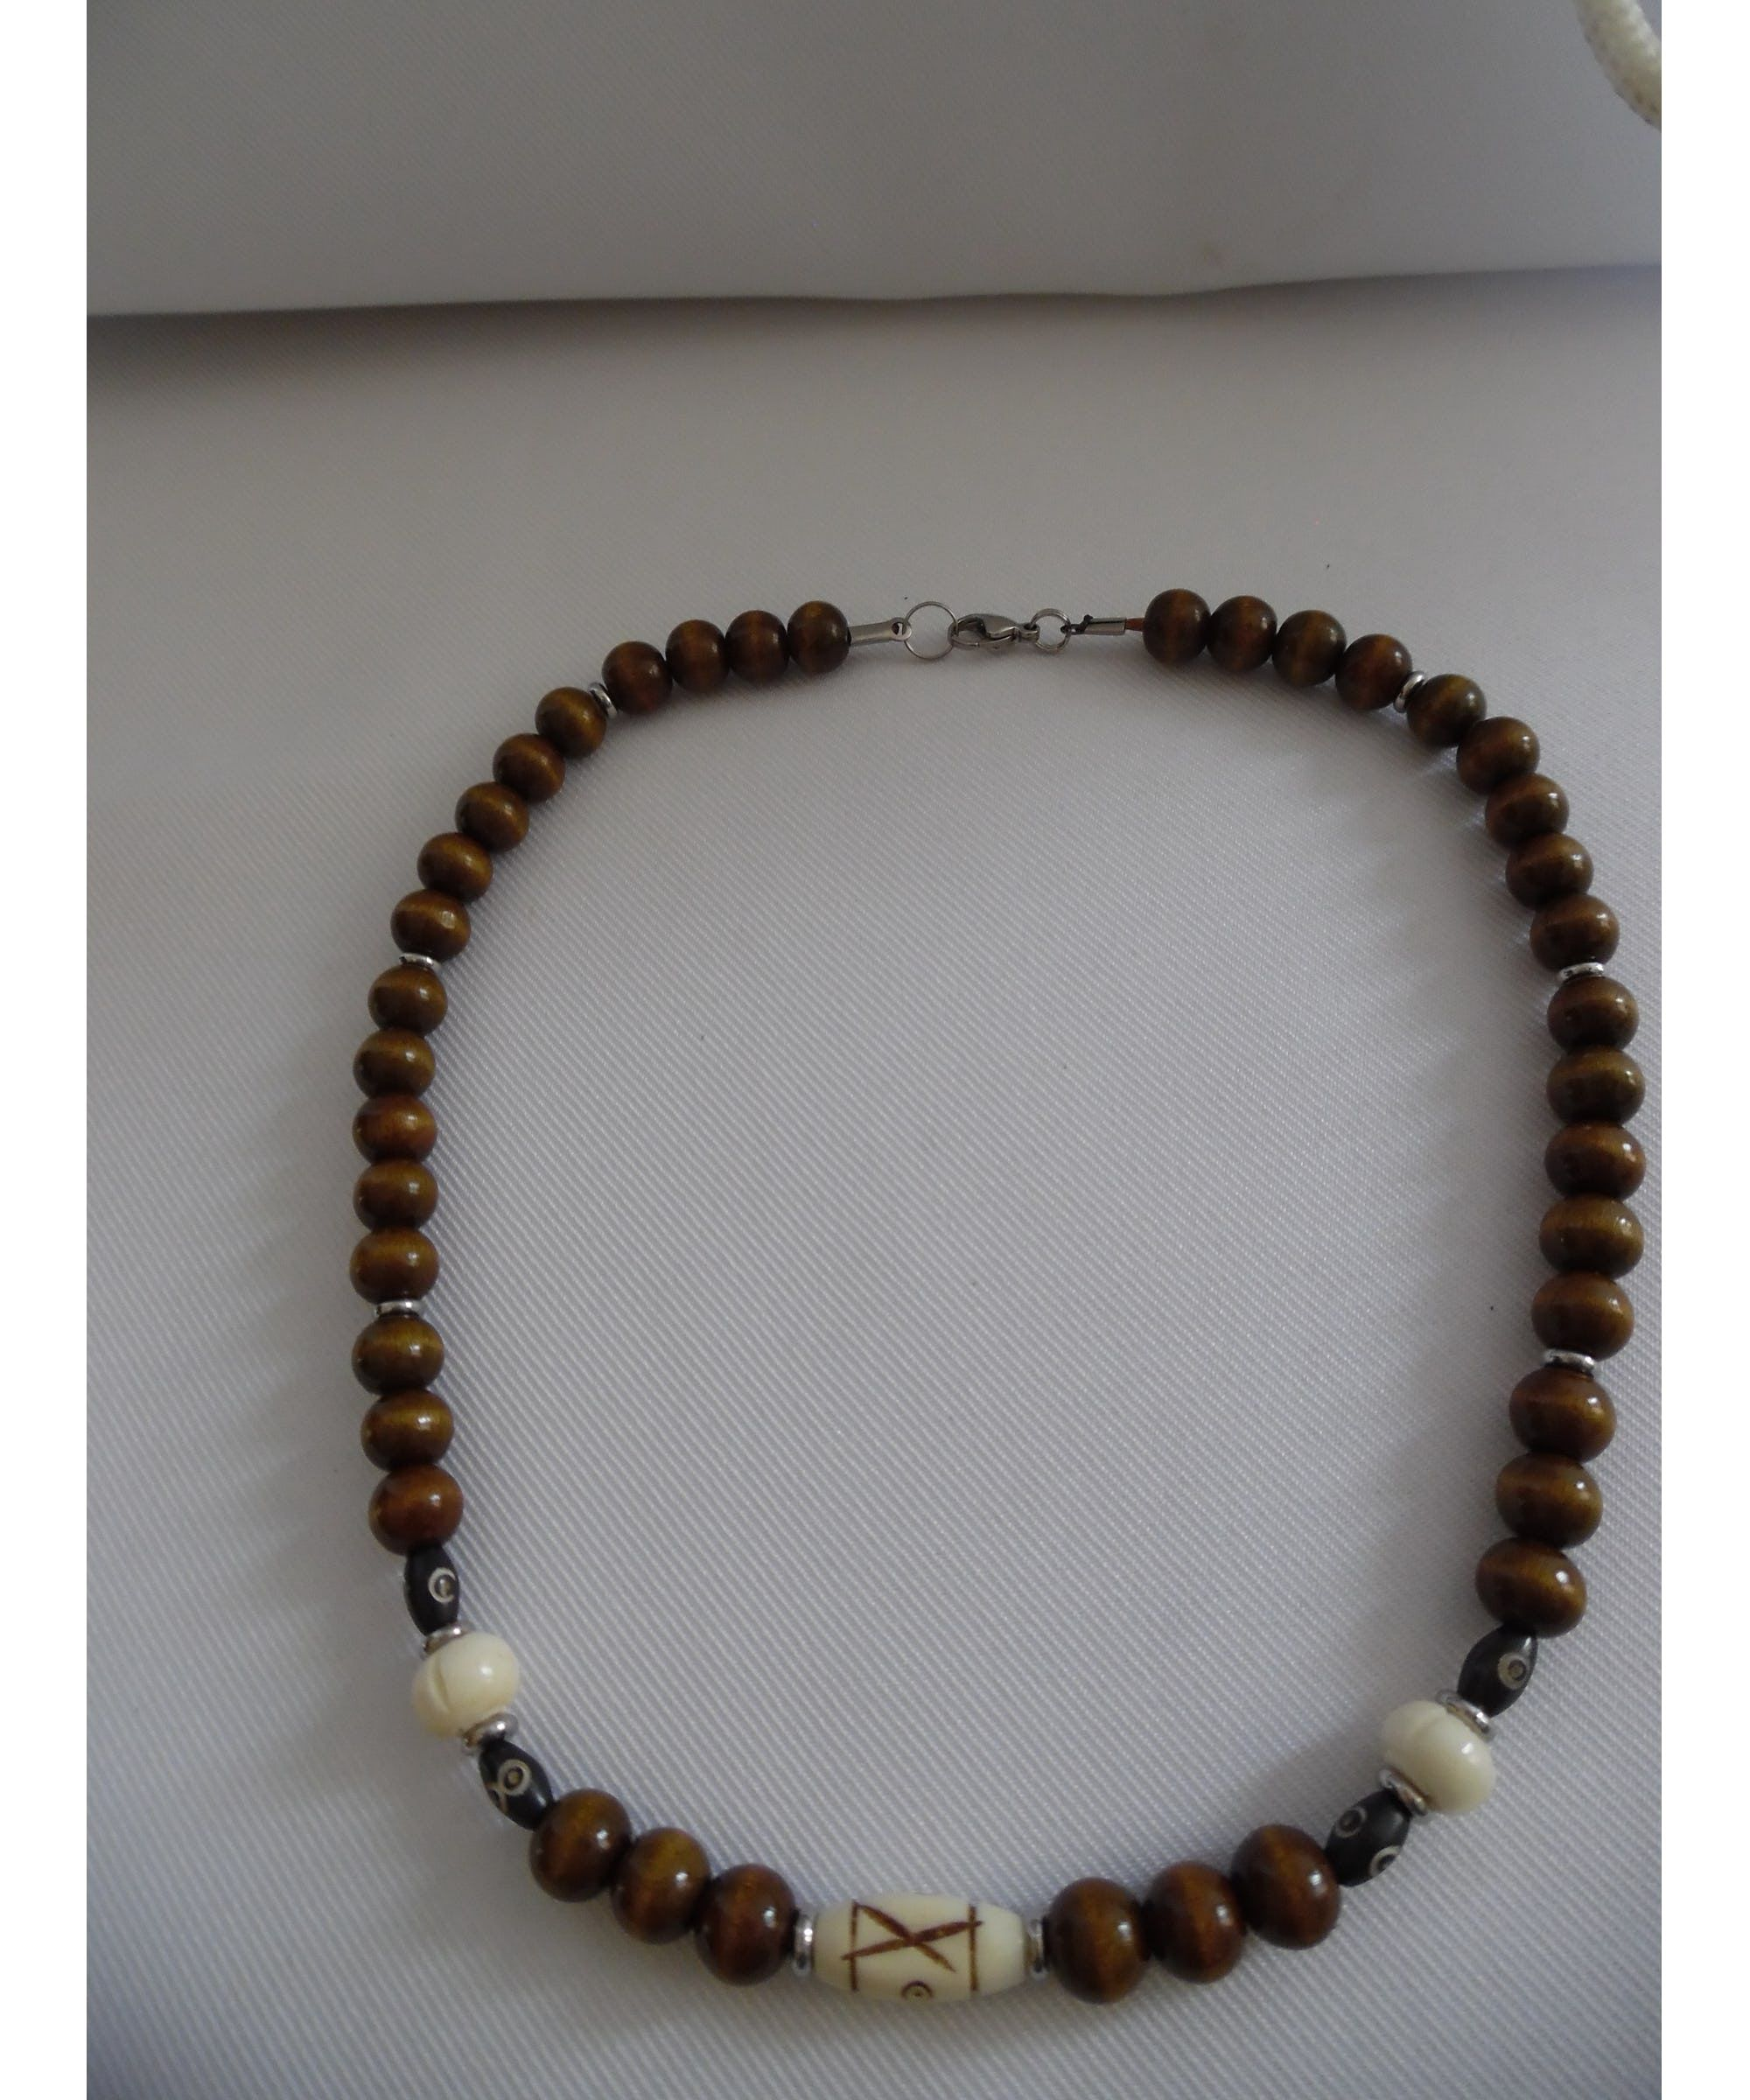 collier homme grosse perle bois